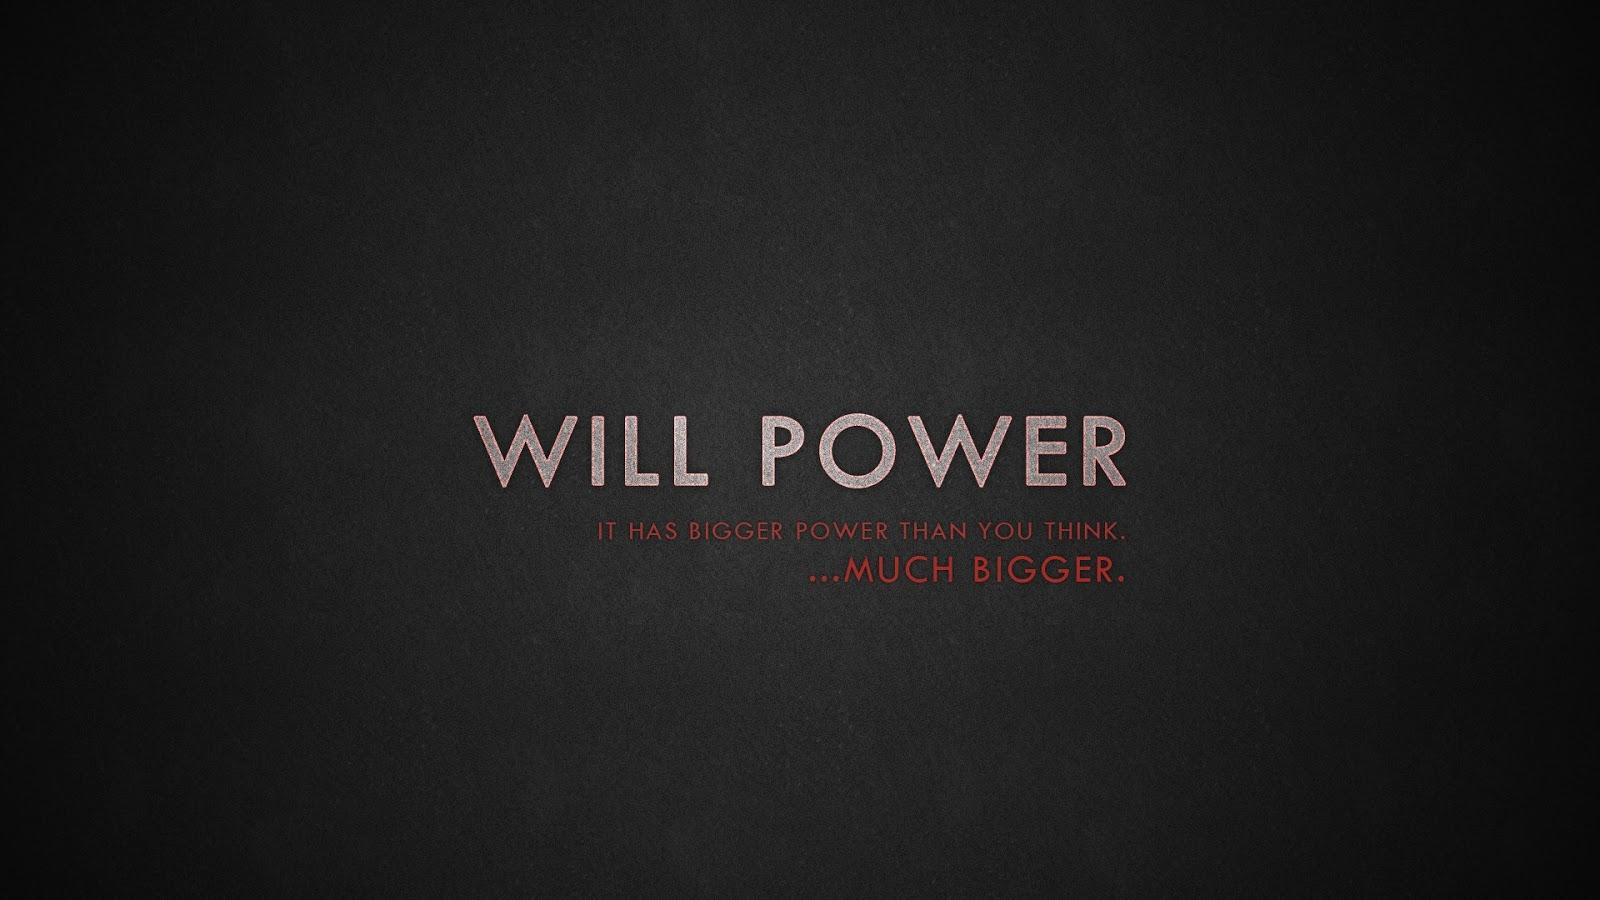 Beautiful Motivational Quote Digital Art Wallpaper